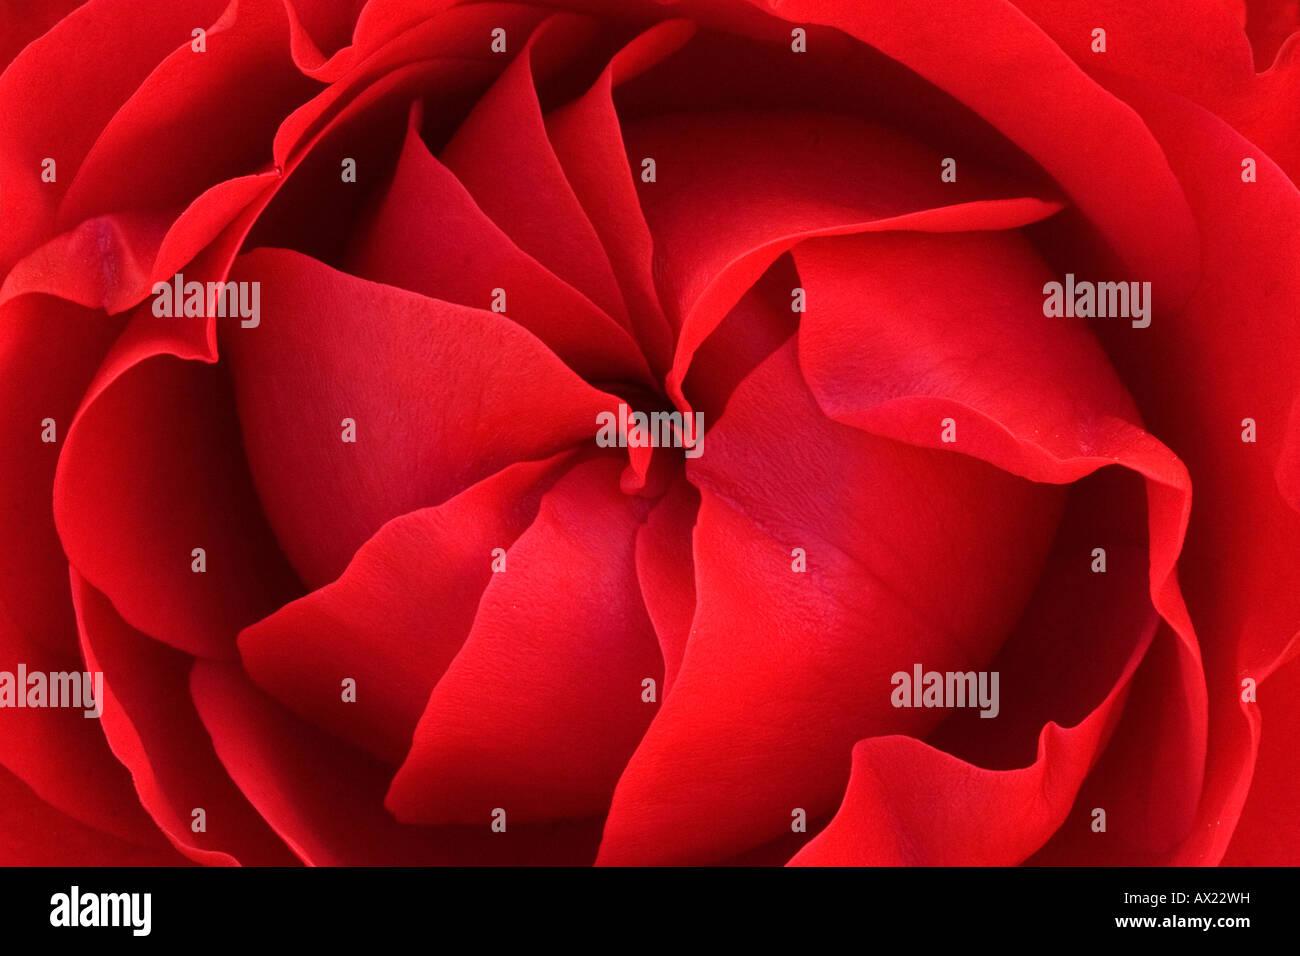 Rote Rose, Ingolstadt, Bayern, Deutschland, Europa Stockbild